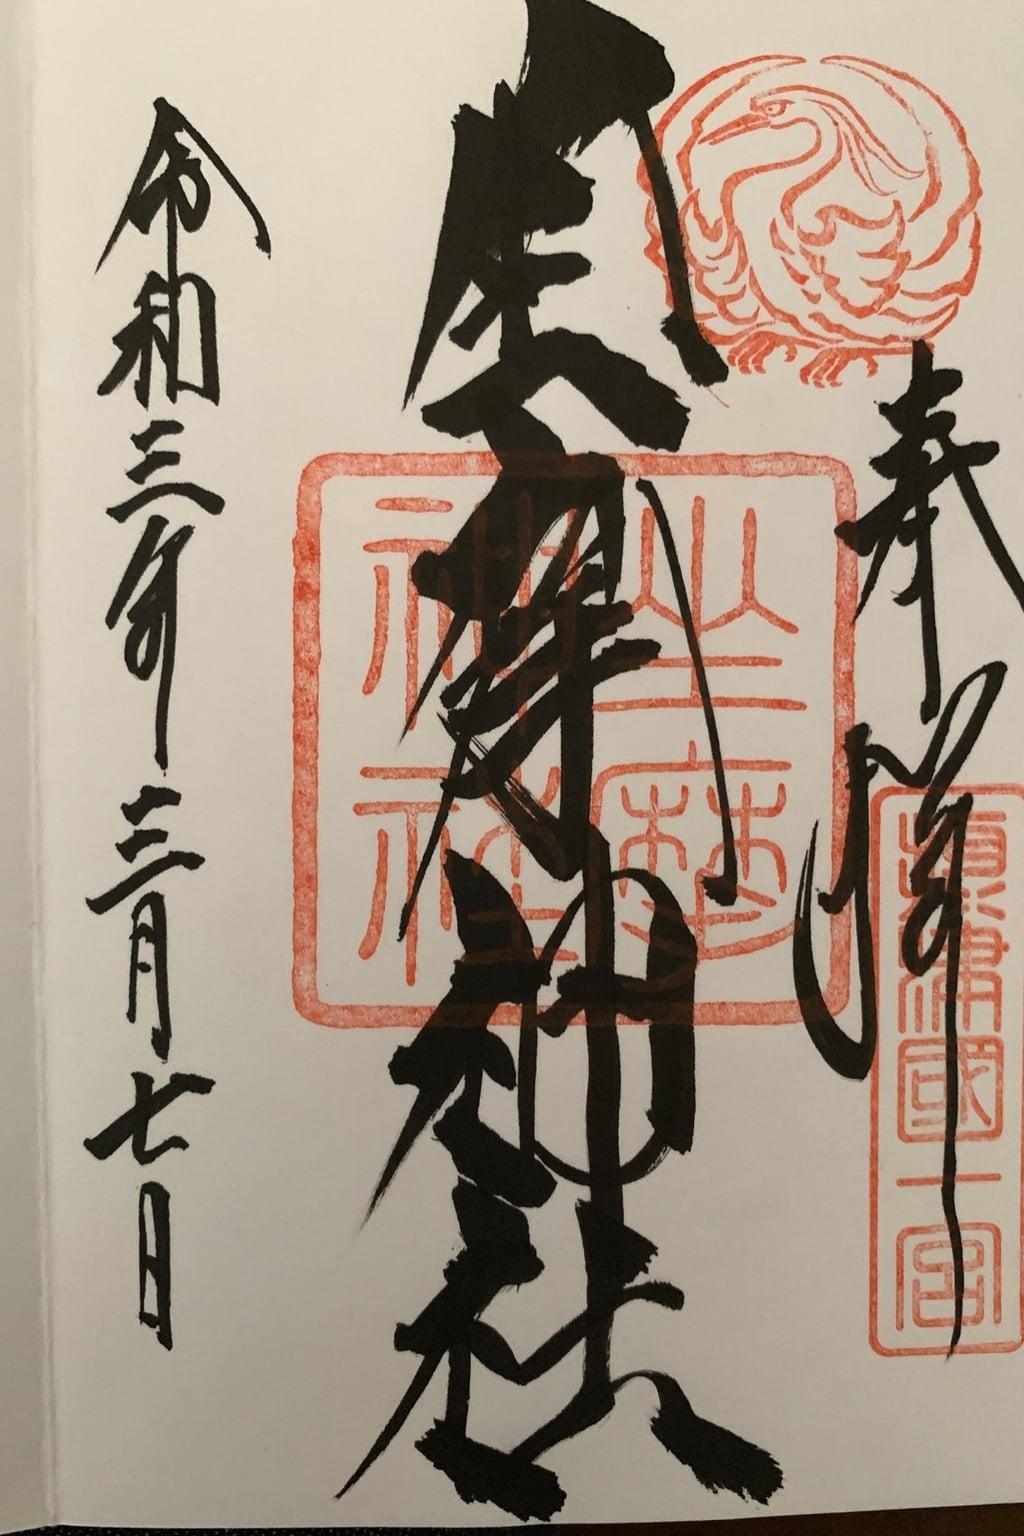 坐摩神社の御朱印